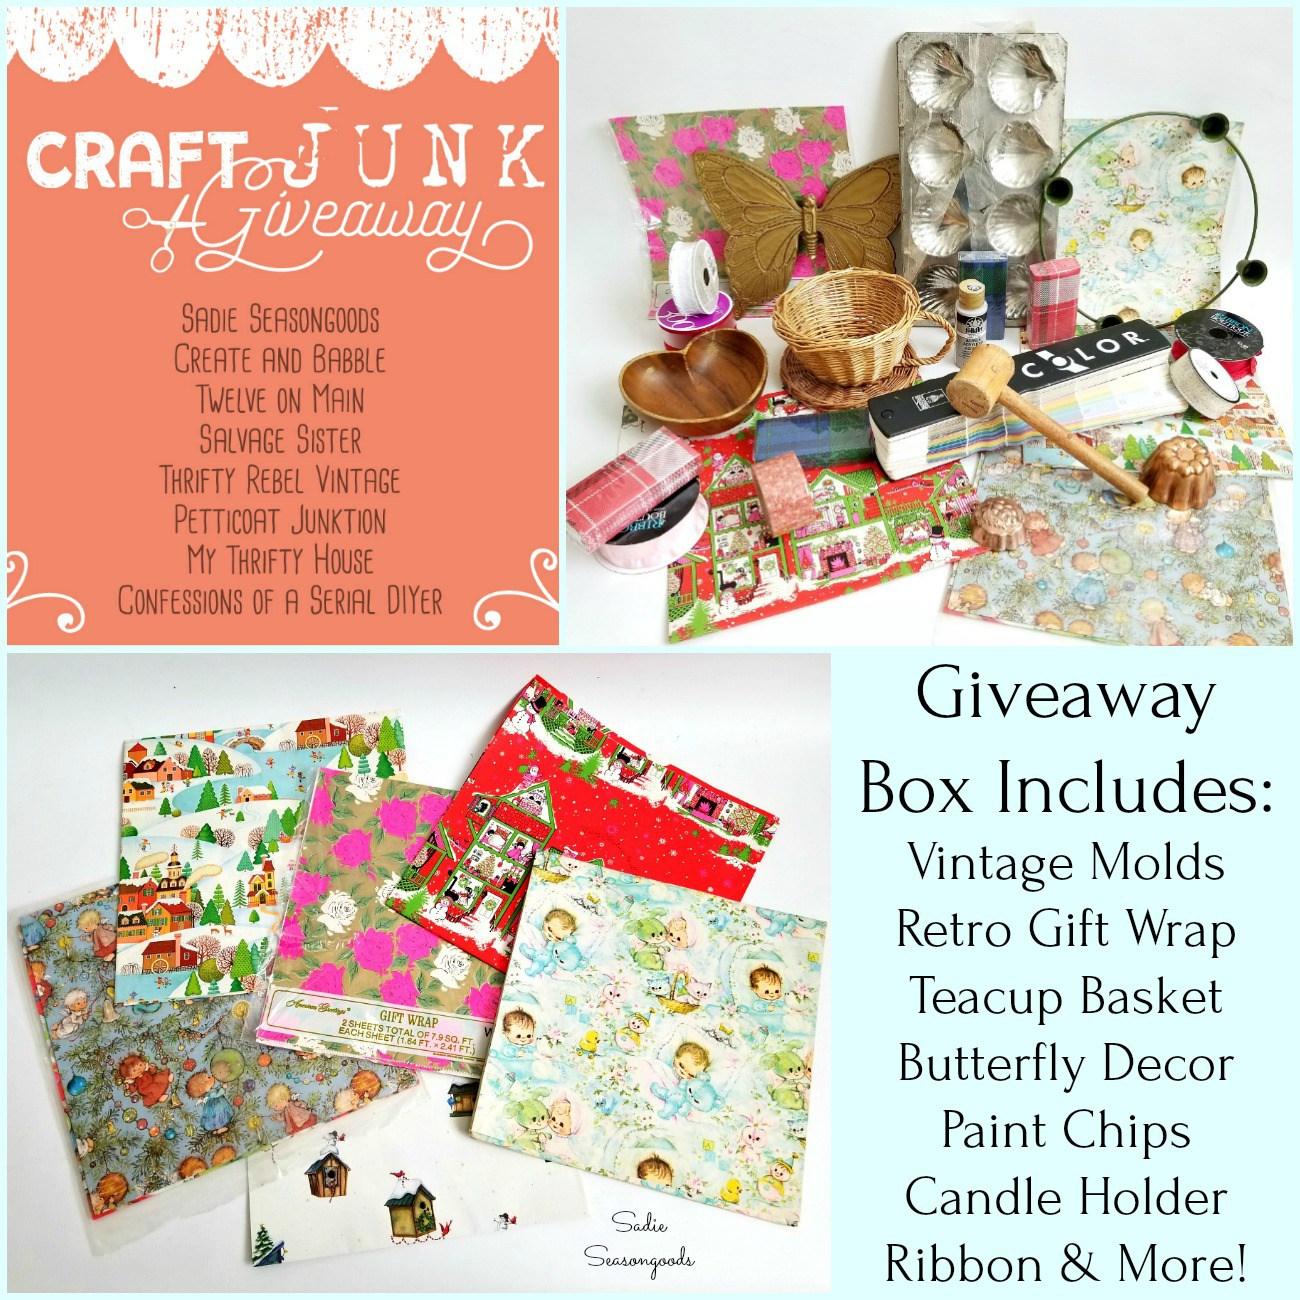 Craft_Junk_Giveaway_April_2018_from_Sadie_Seasongoods